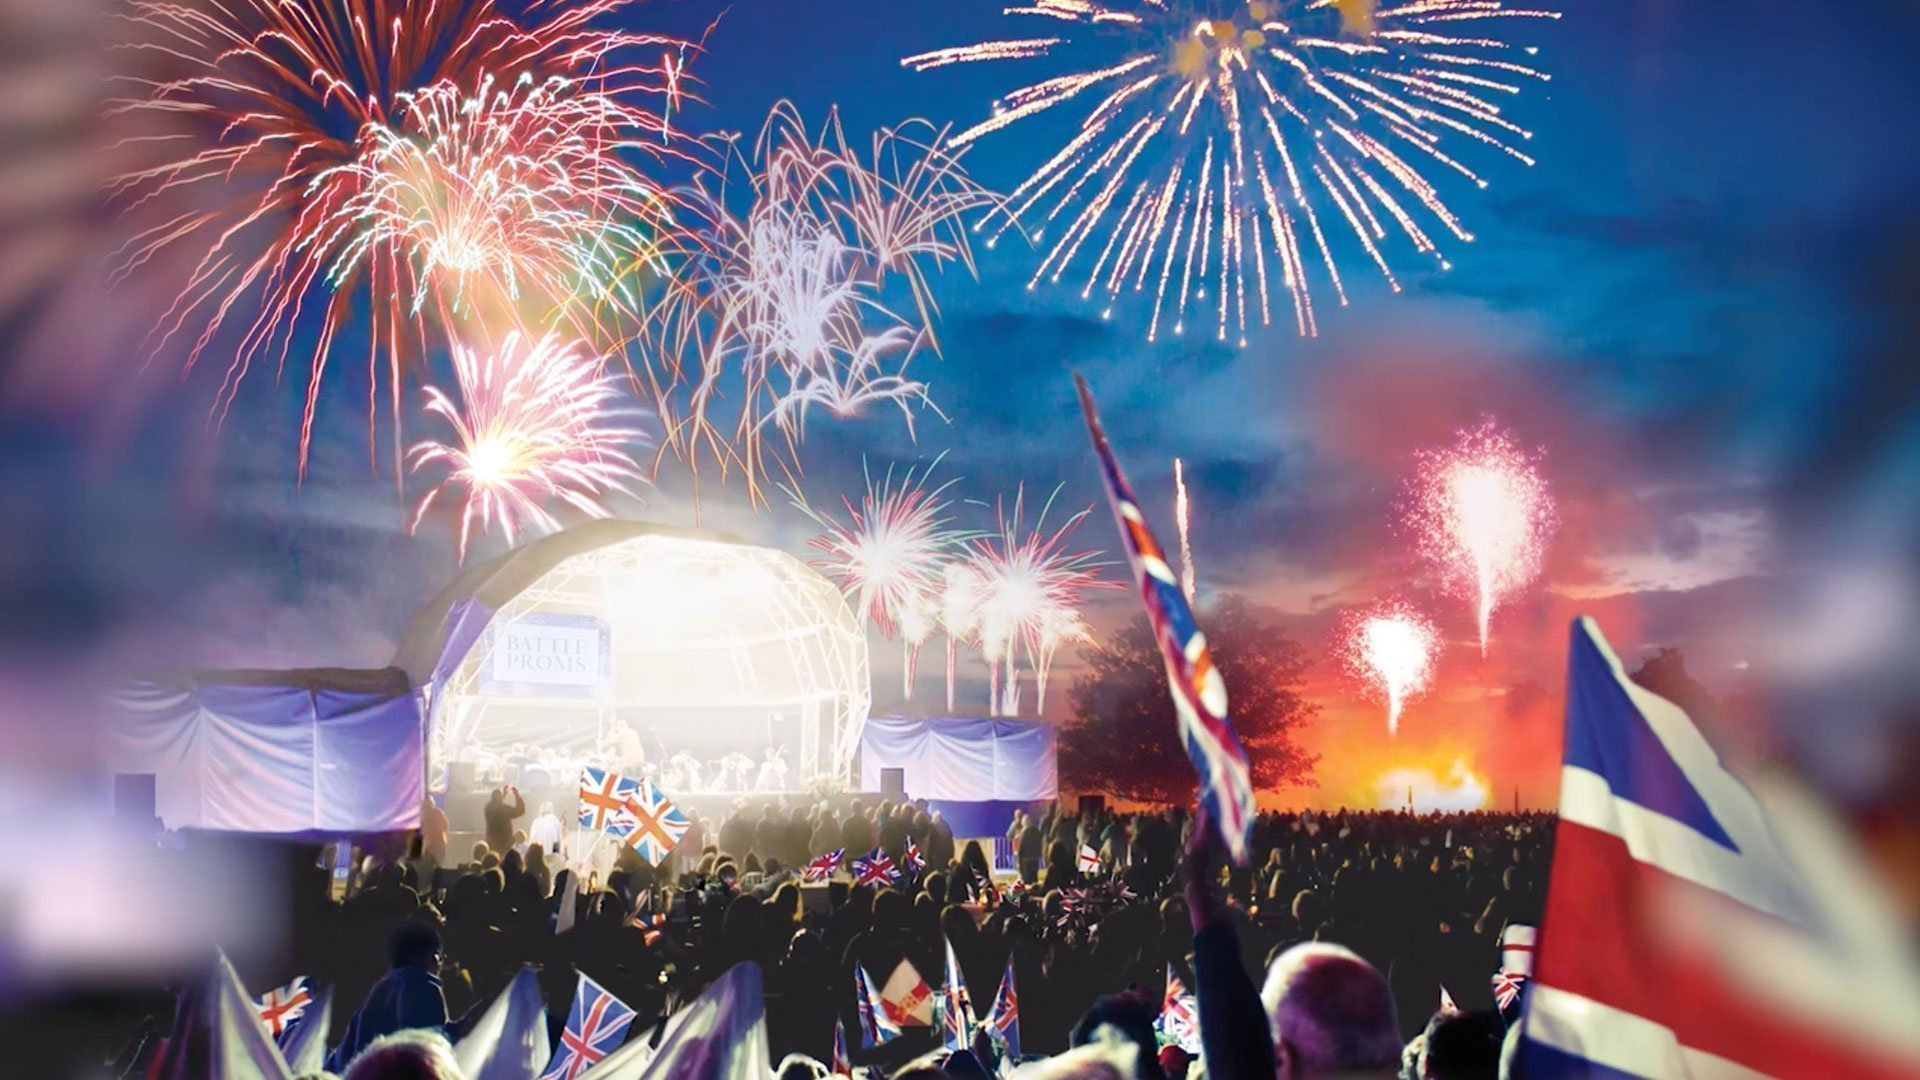 Battle Proms Picnic Concert at Blenheim Palace